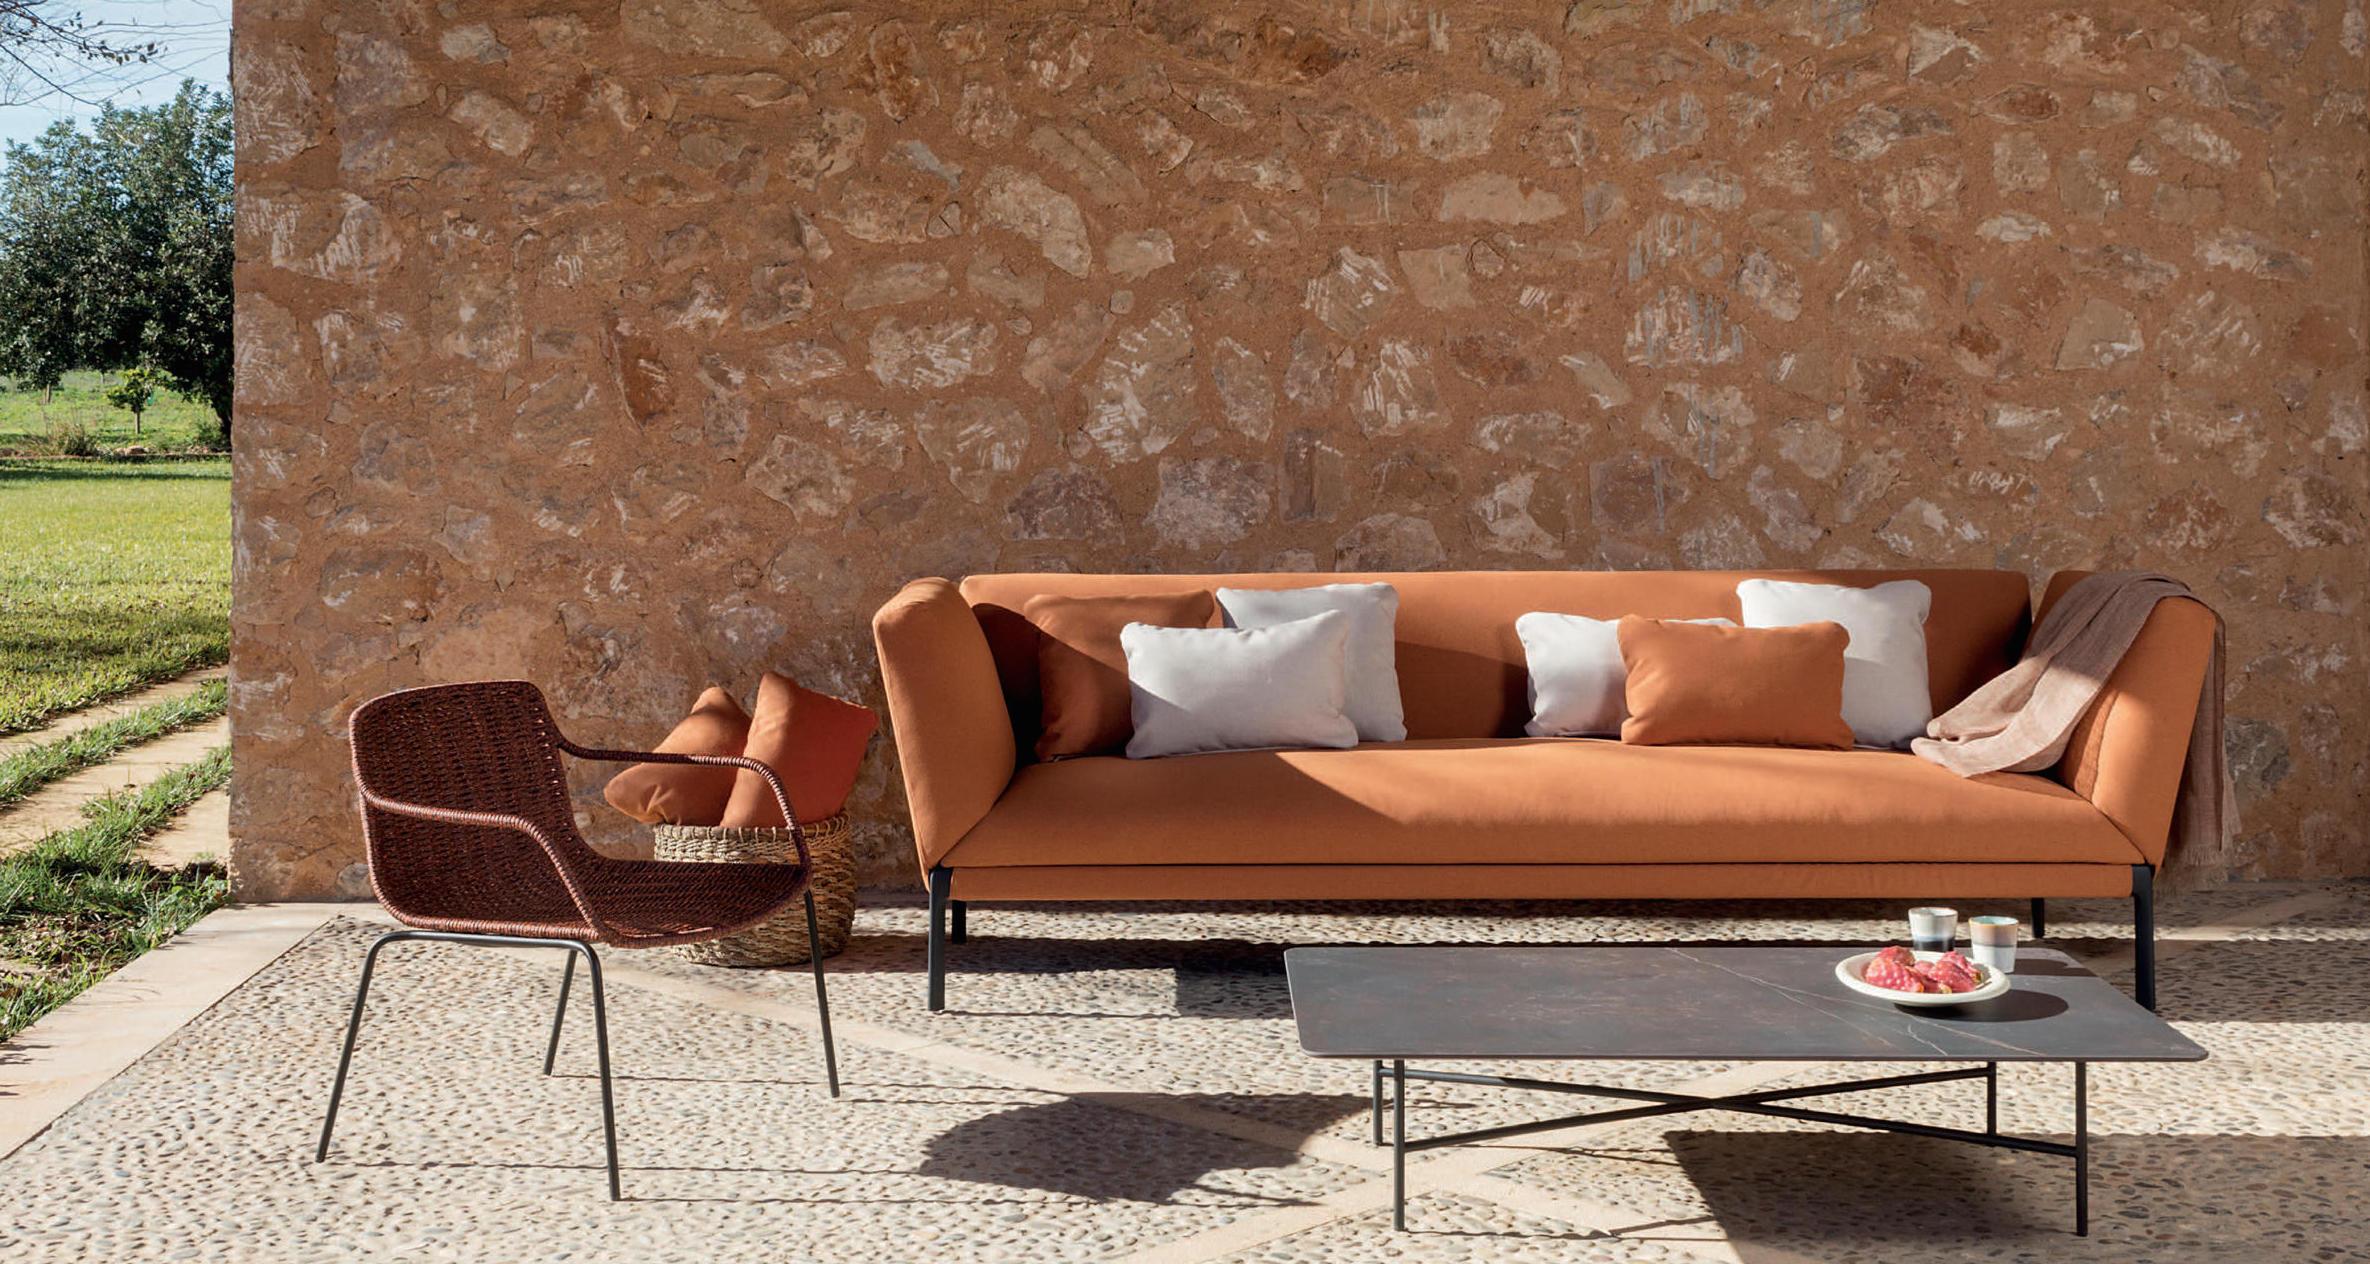 Outdoor Chairs: Livit XL Sofa